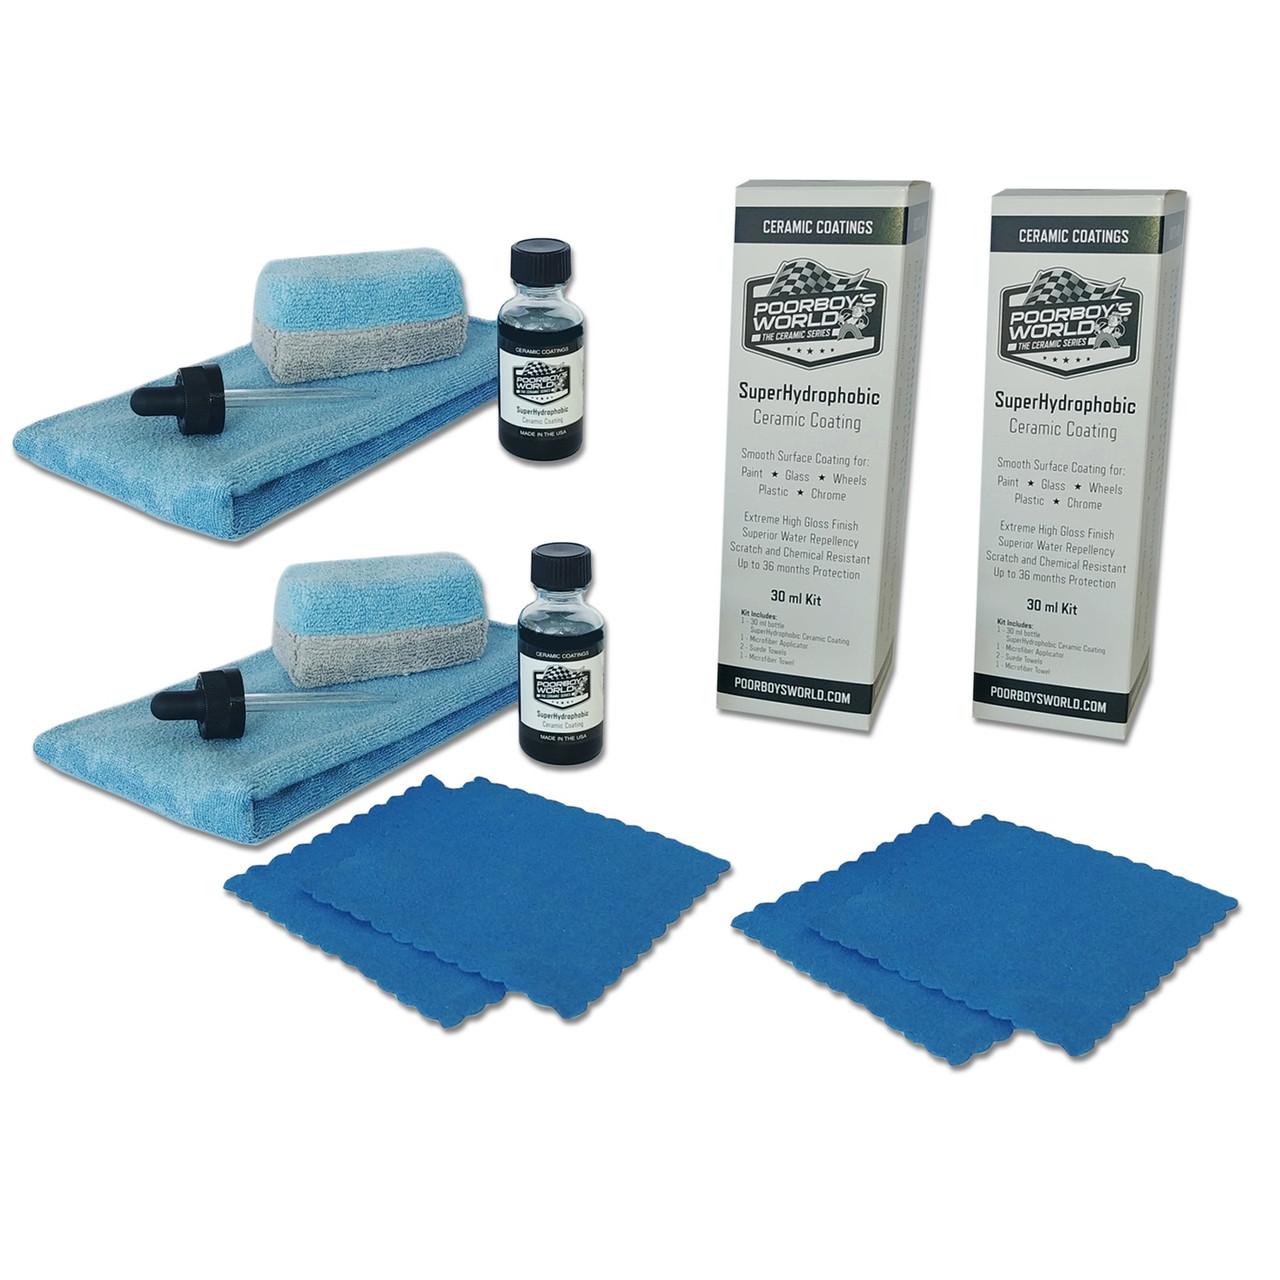 Poorboy's World SuperHydrophobic Ceramic Coating 60 ml Kit (30 ml x 2)